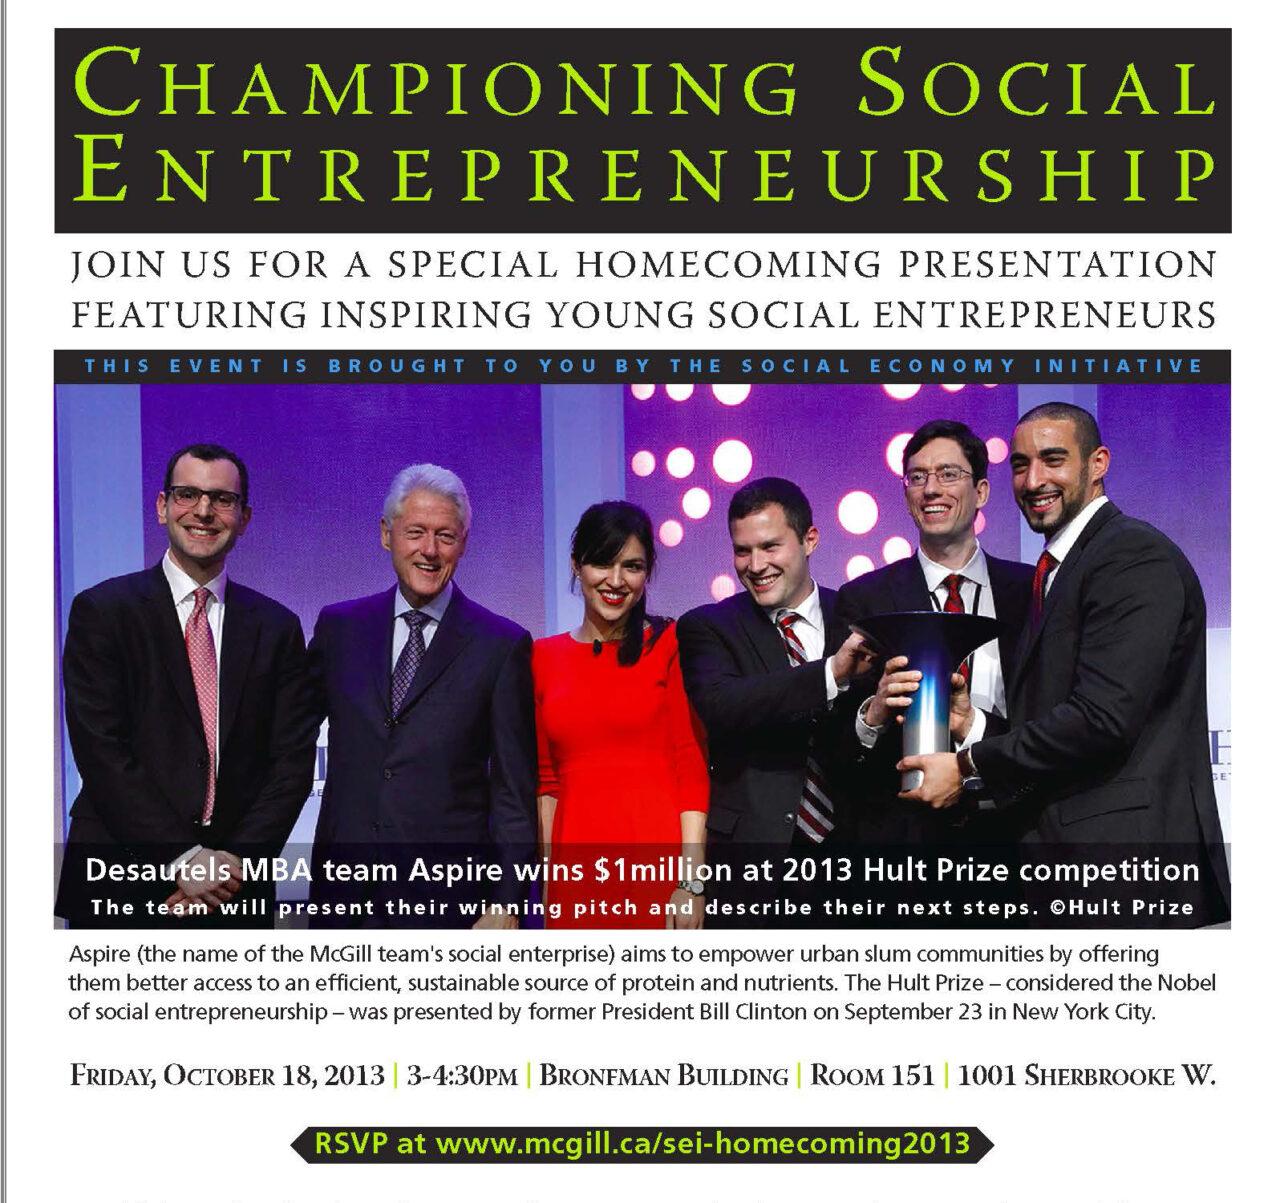 Championing Social Entrepreneurship